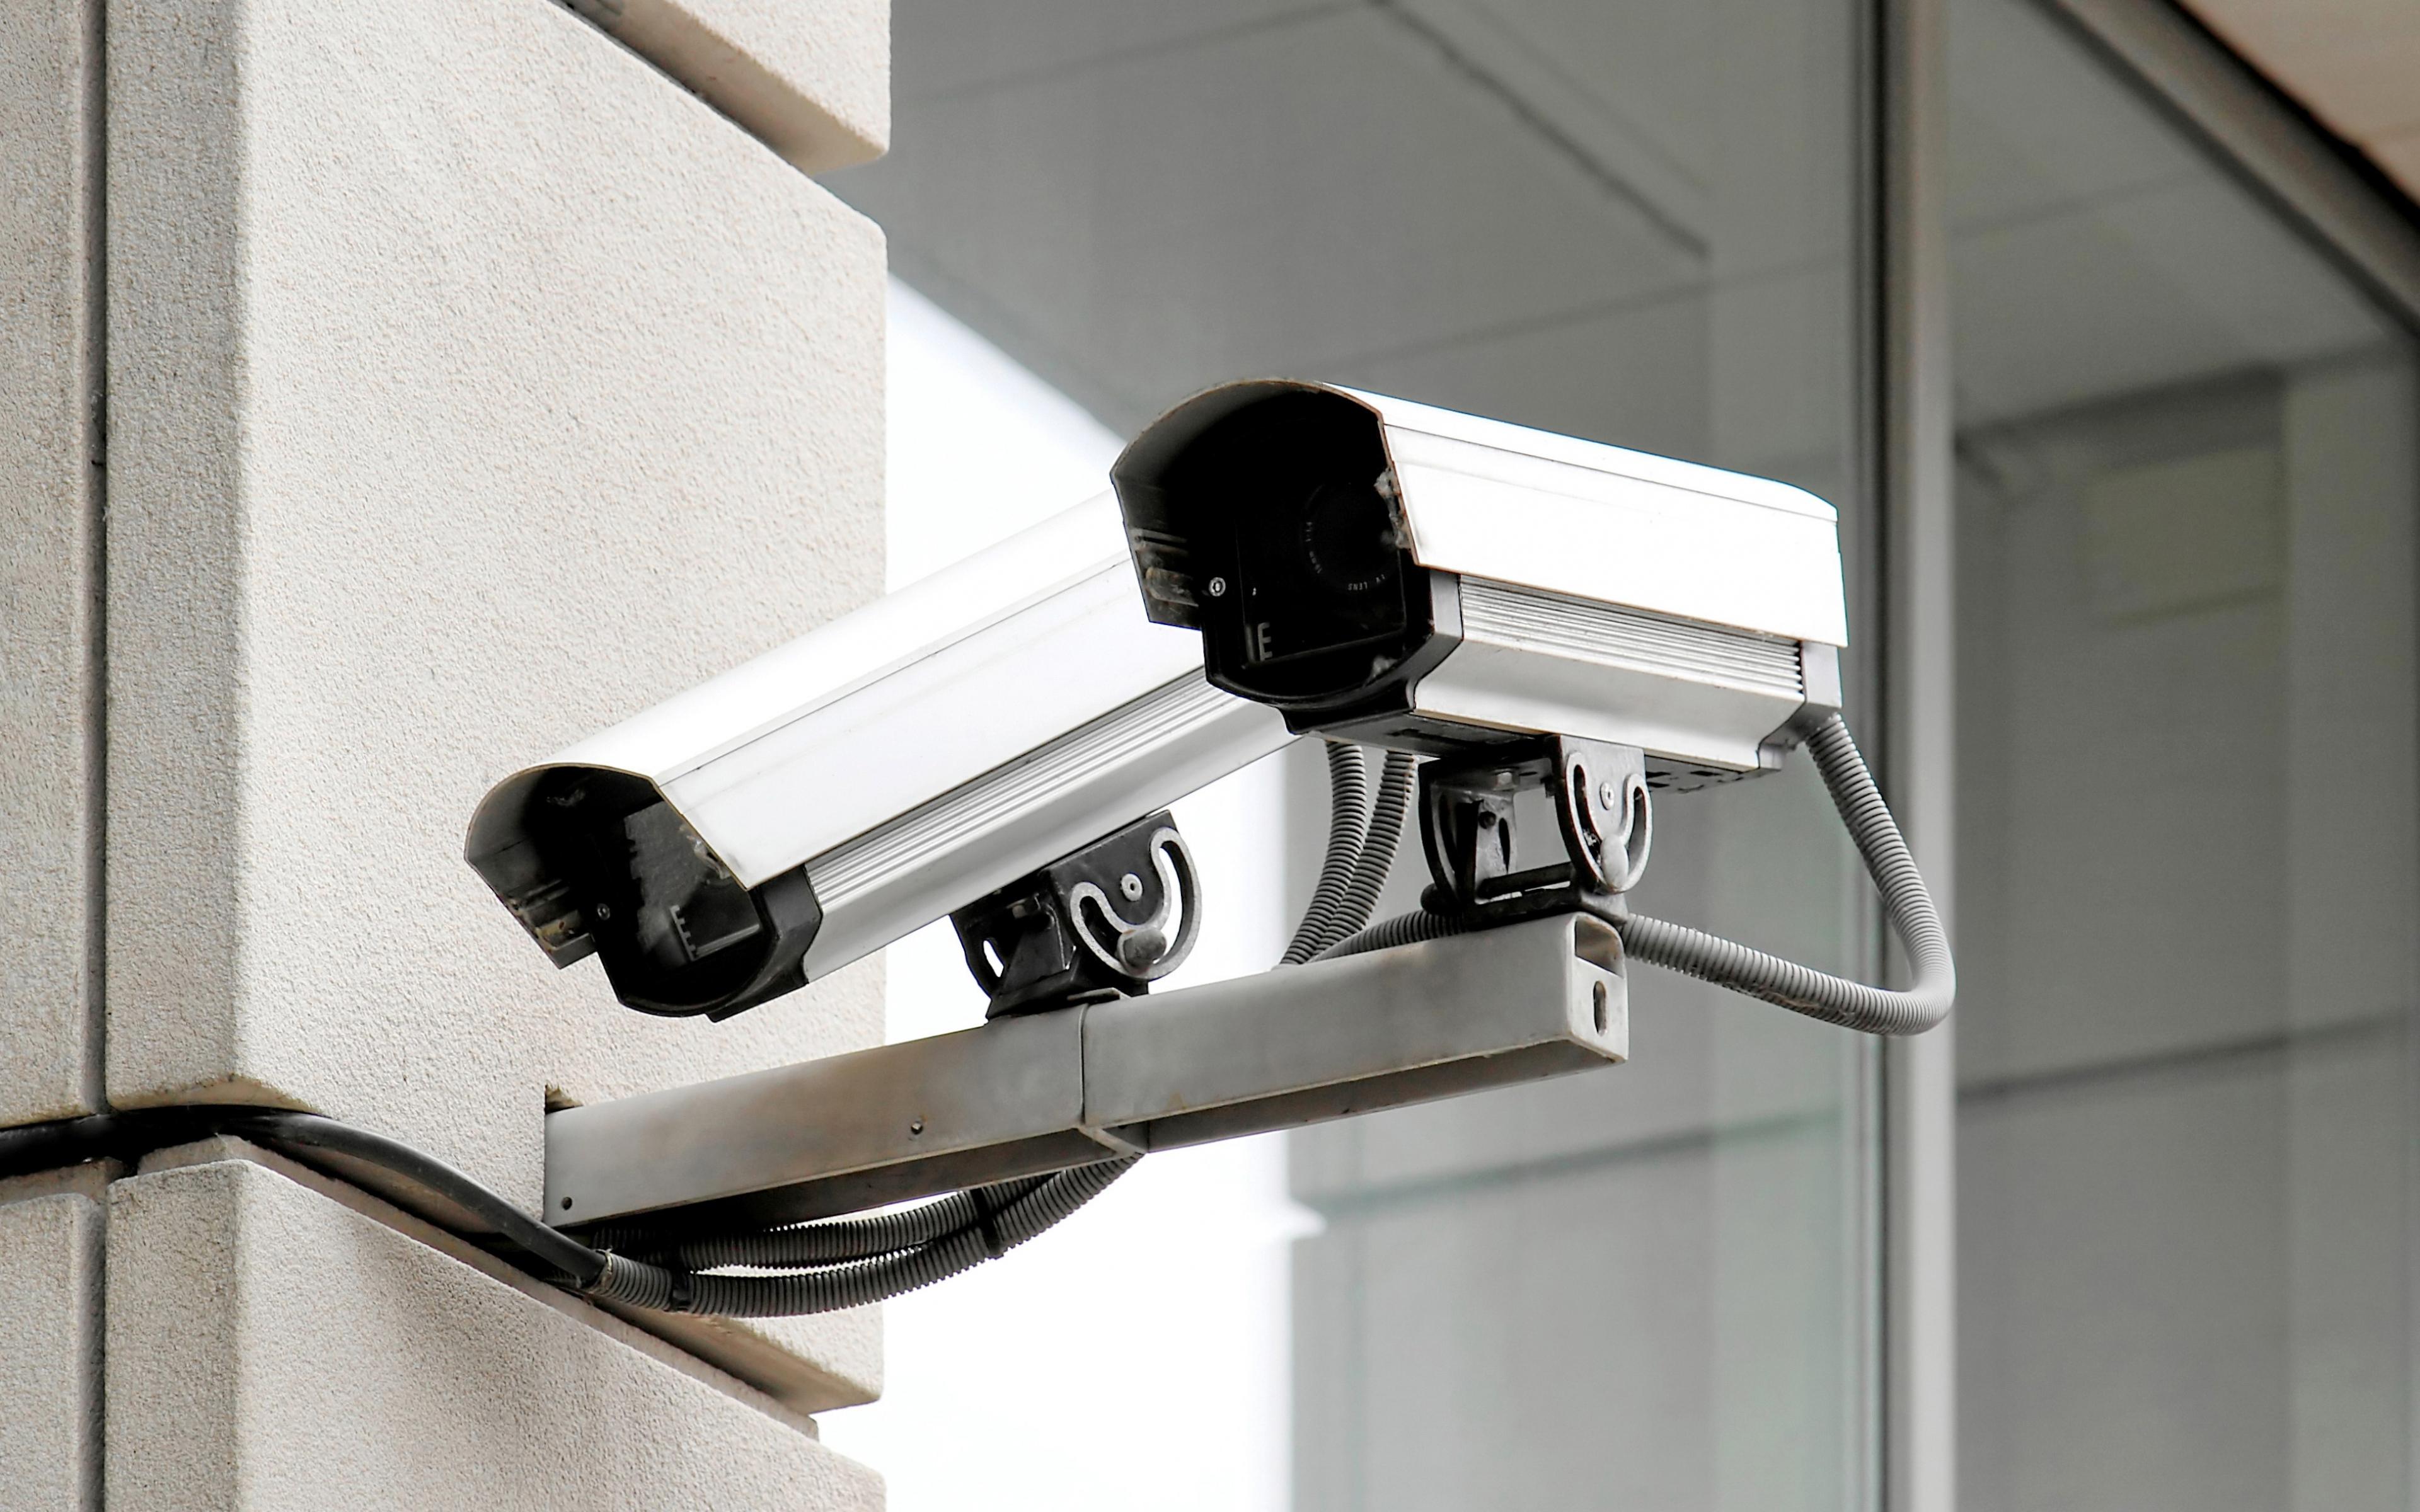 security camera wallpaper wallpapersafari. Black Bedroom Furniture Sets. Home Design Ideas